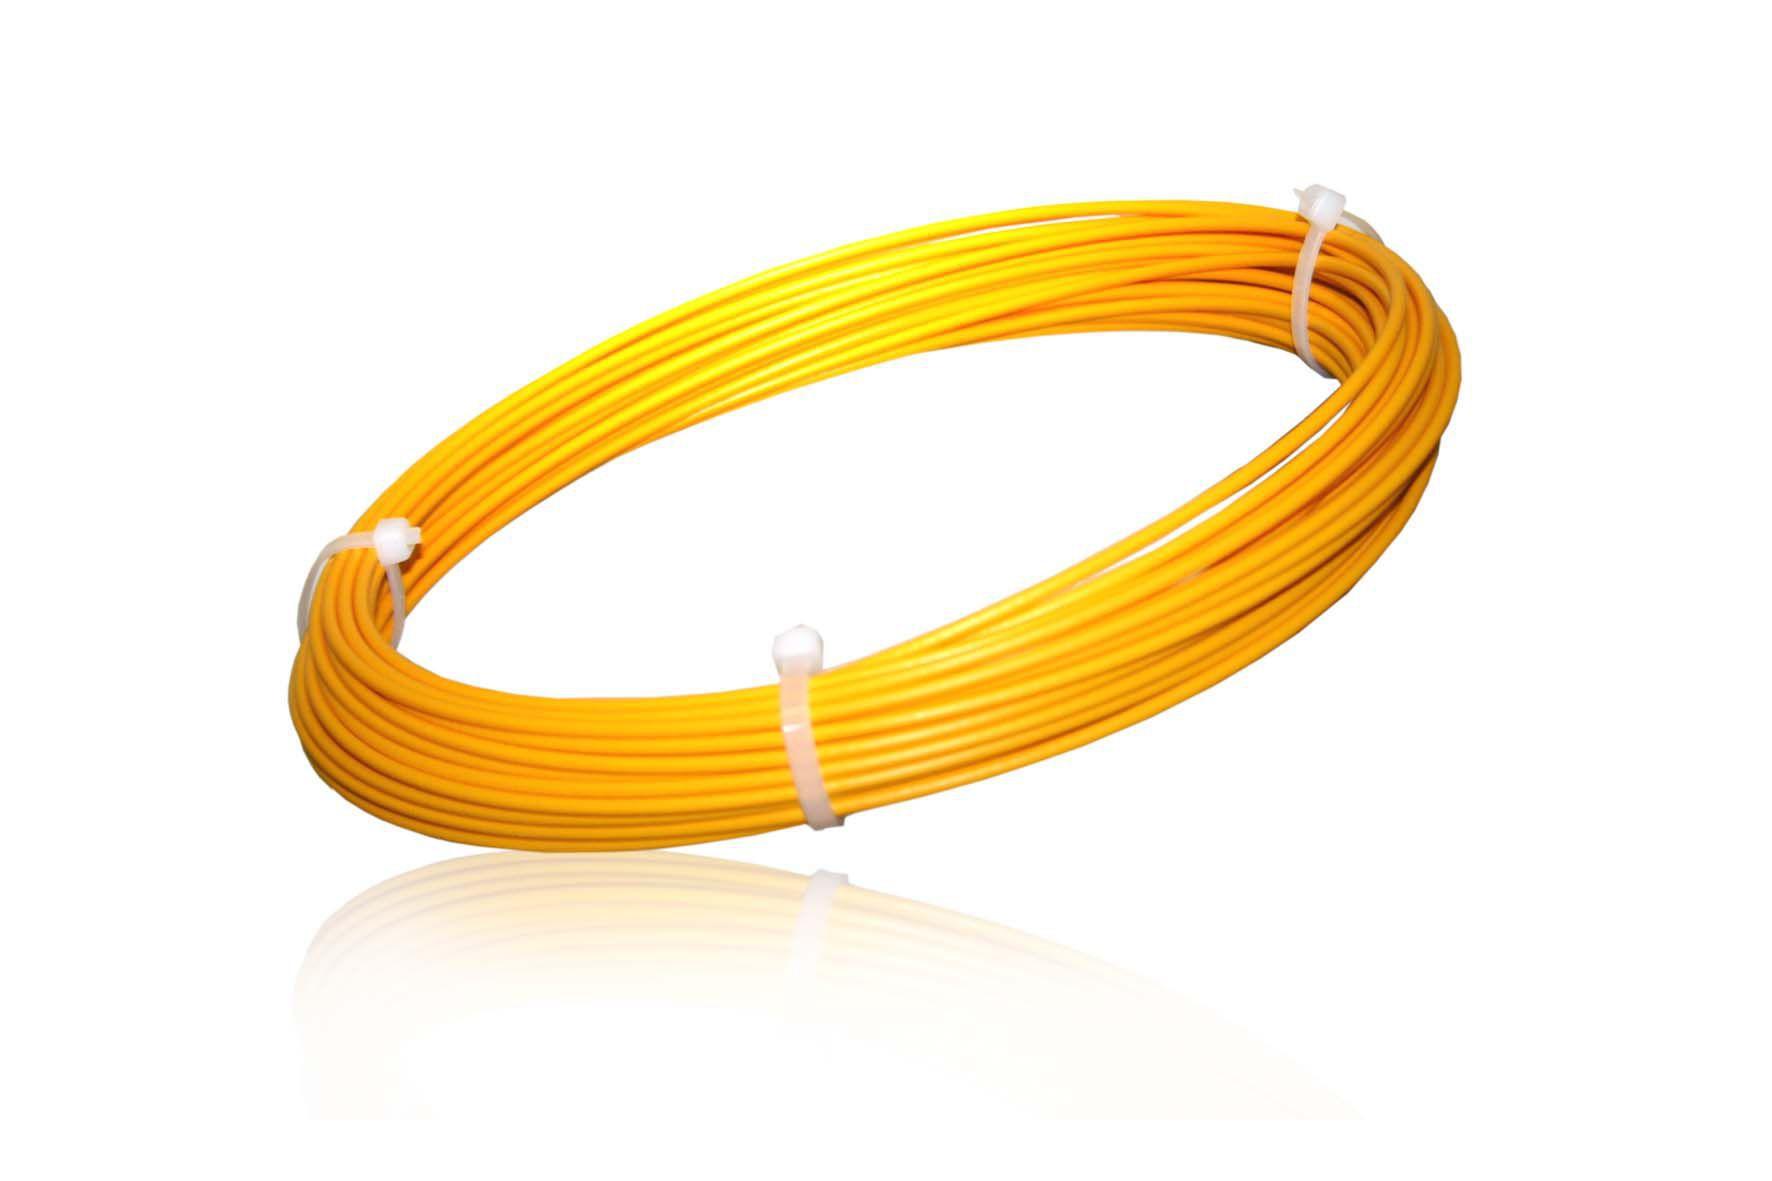 Flexible cable puller - Polykat® - Katimex® Cielker GmbH on